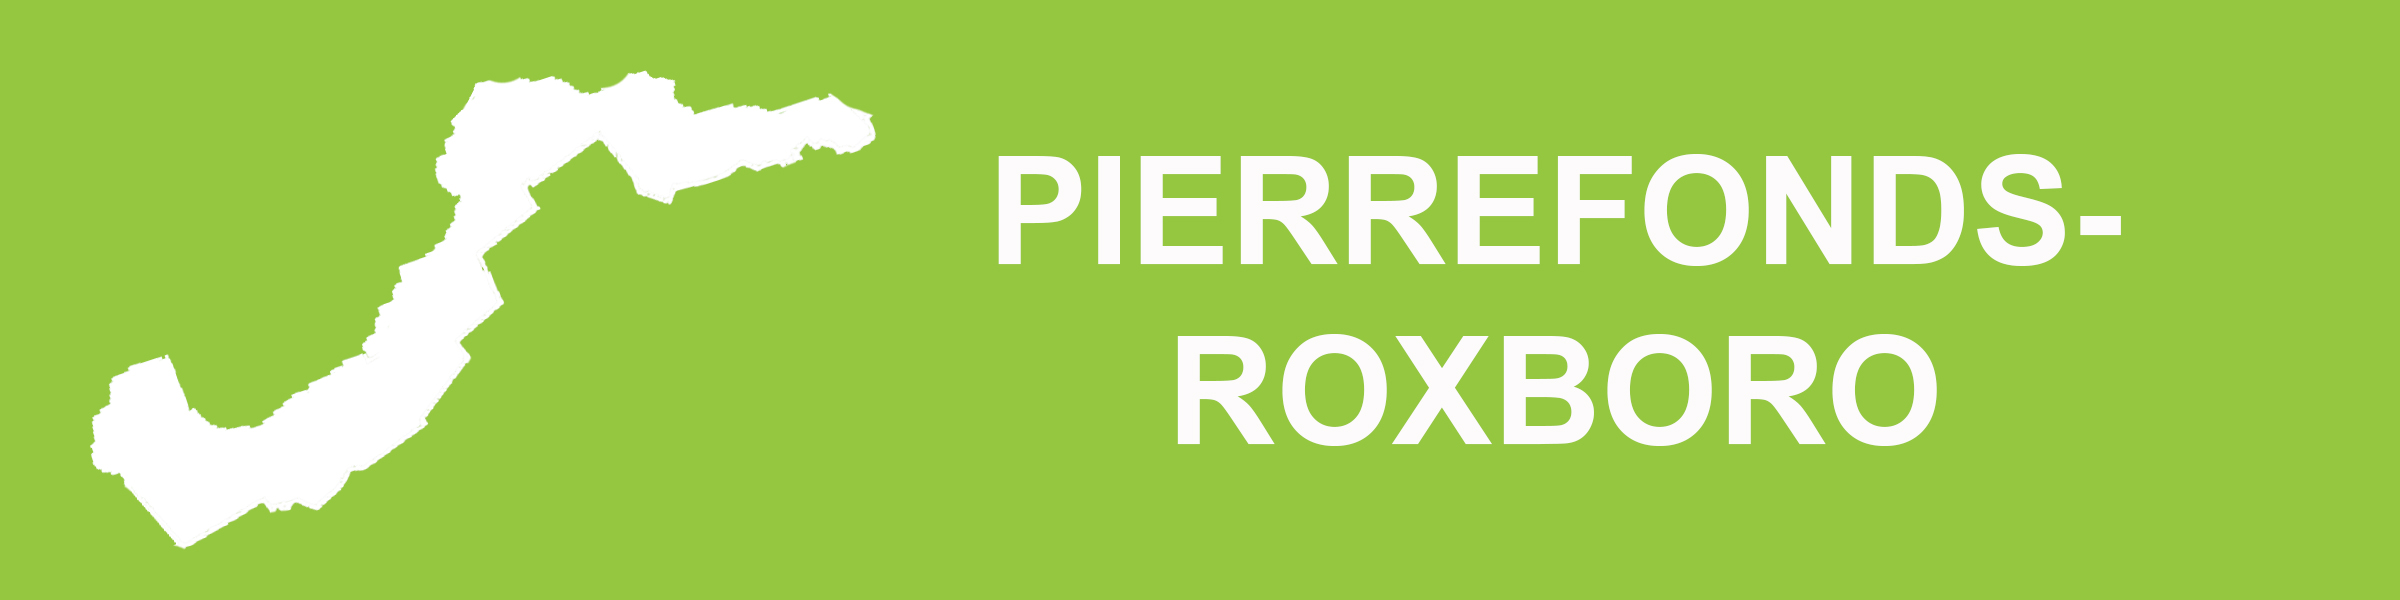 PIERREFONDS-ROXBORO